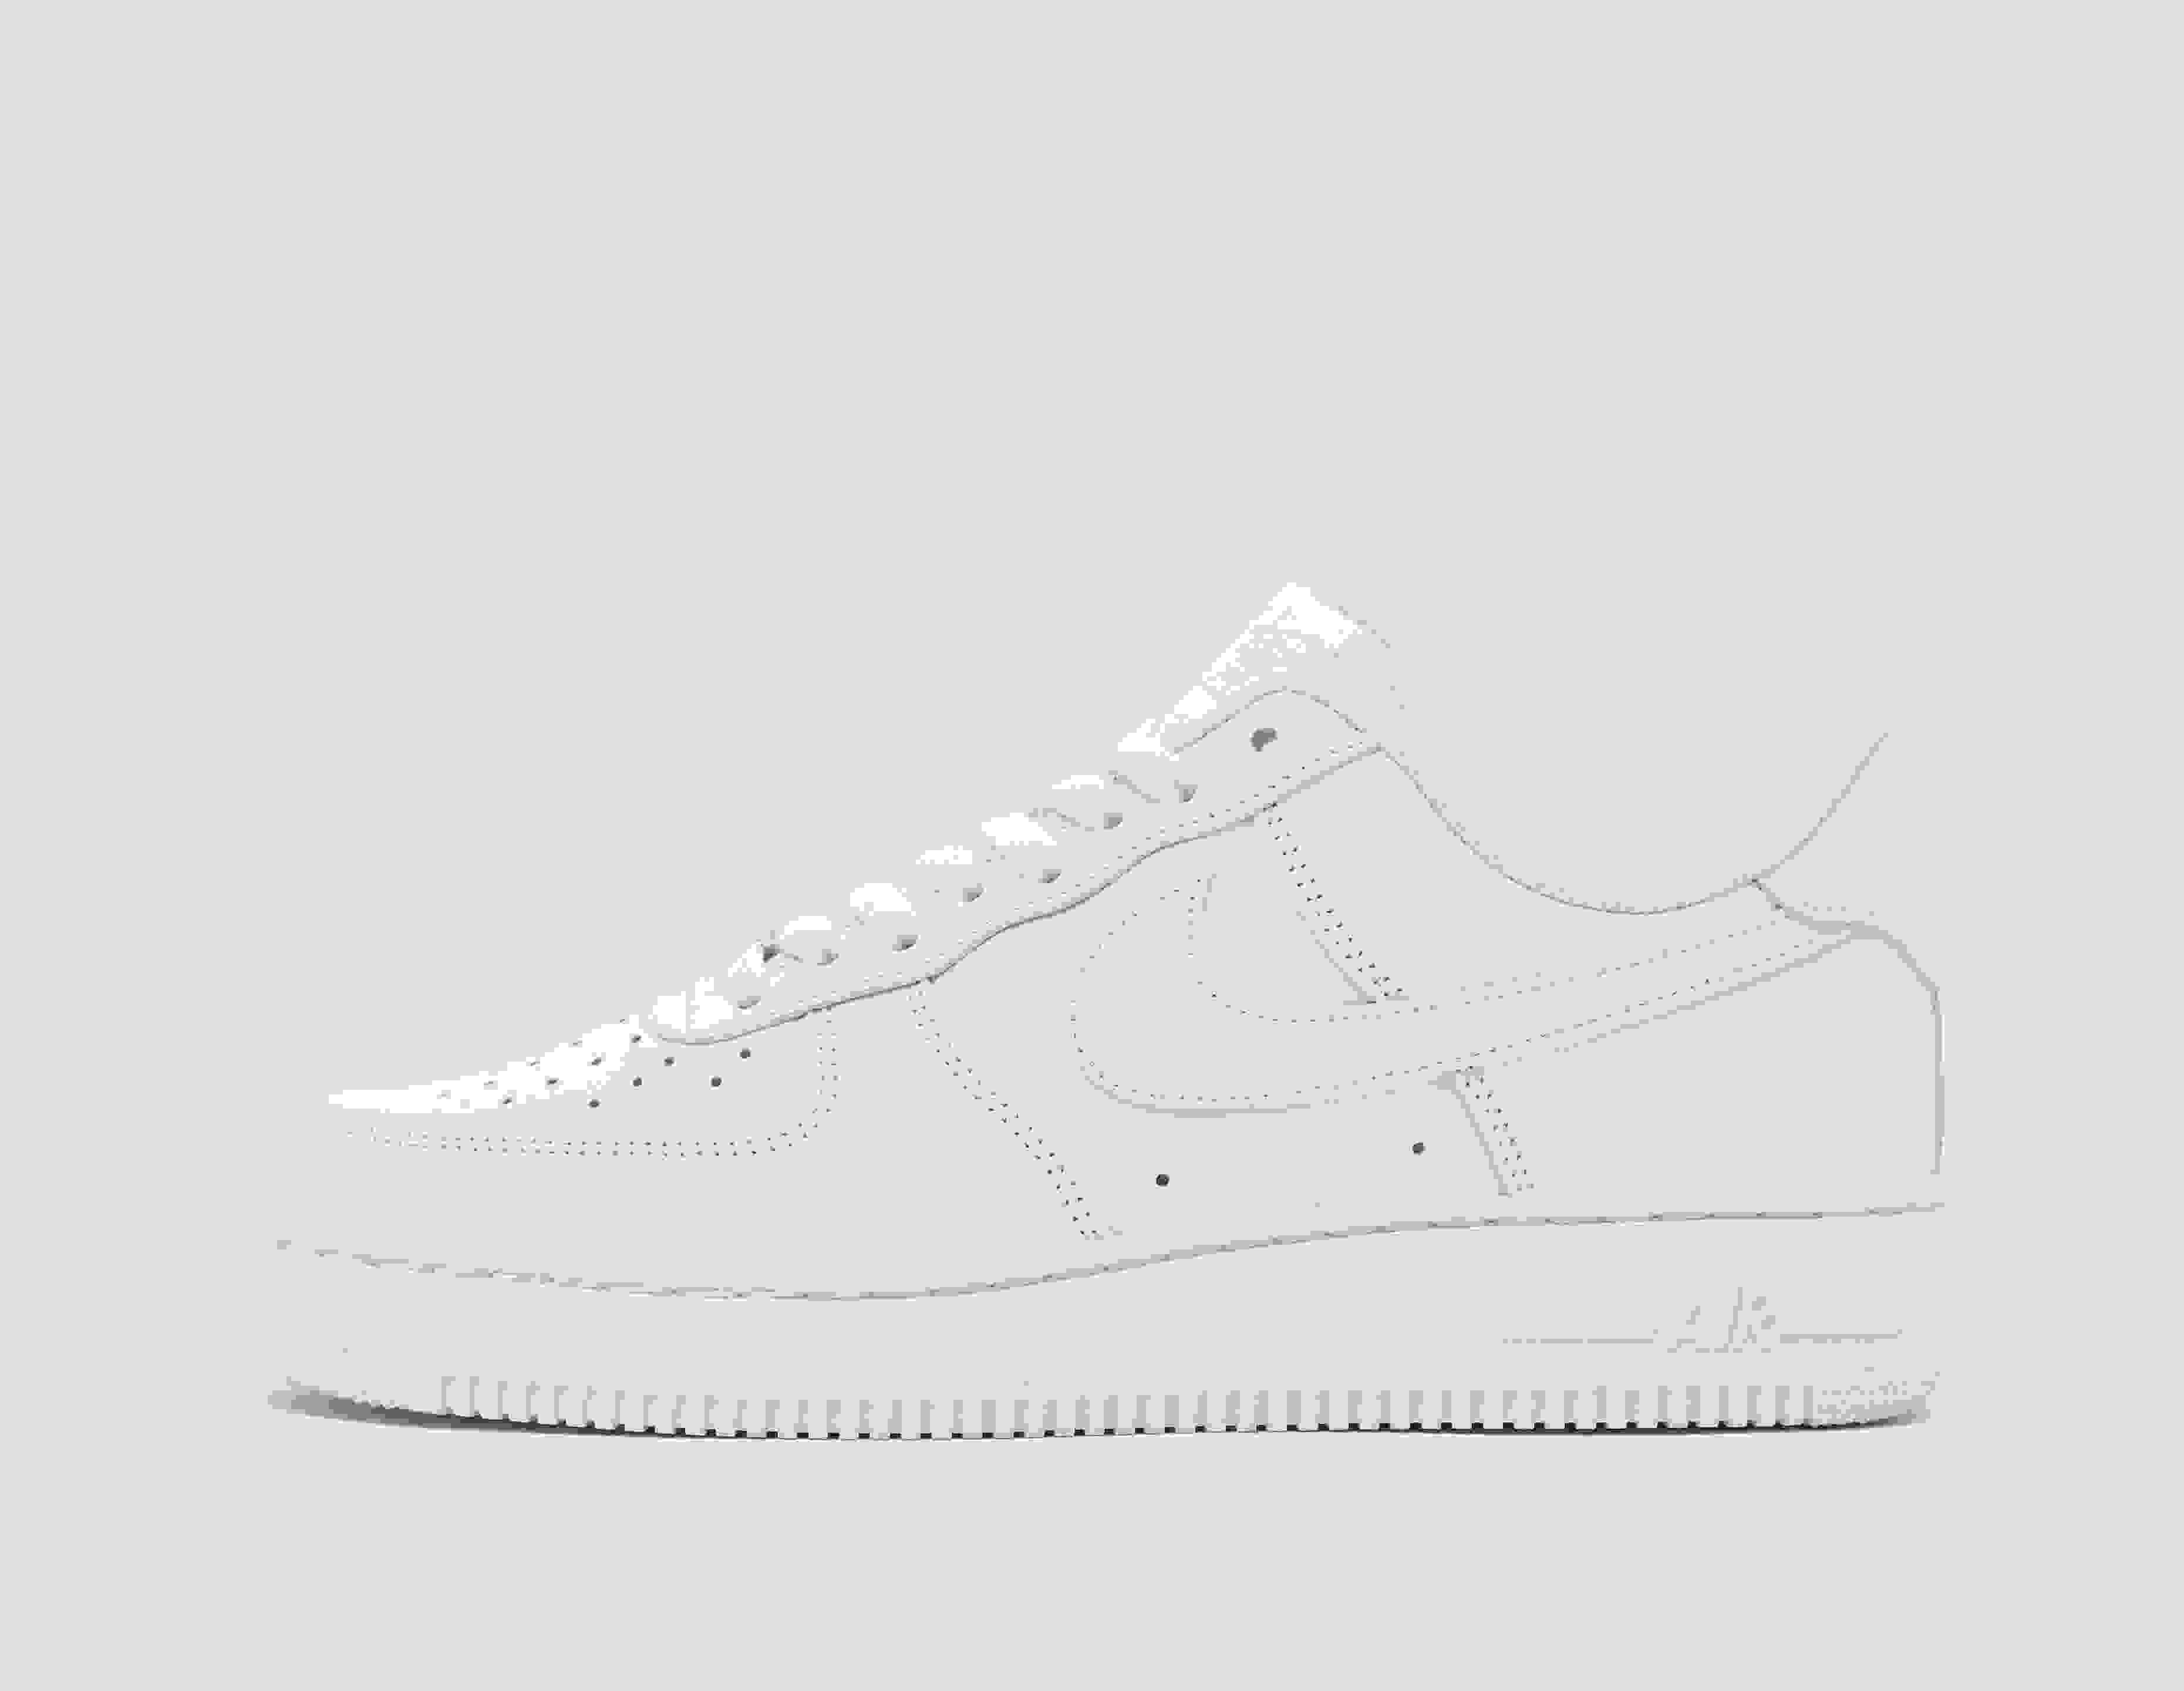 nike air force 1 white. Nike Air Force 1 Low White